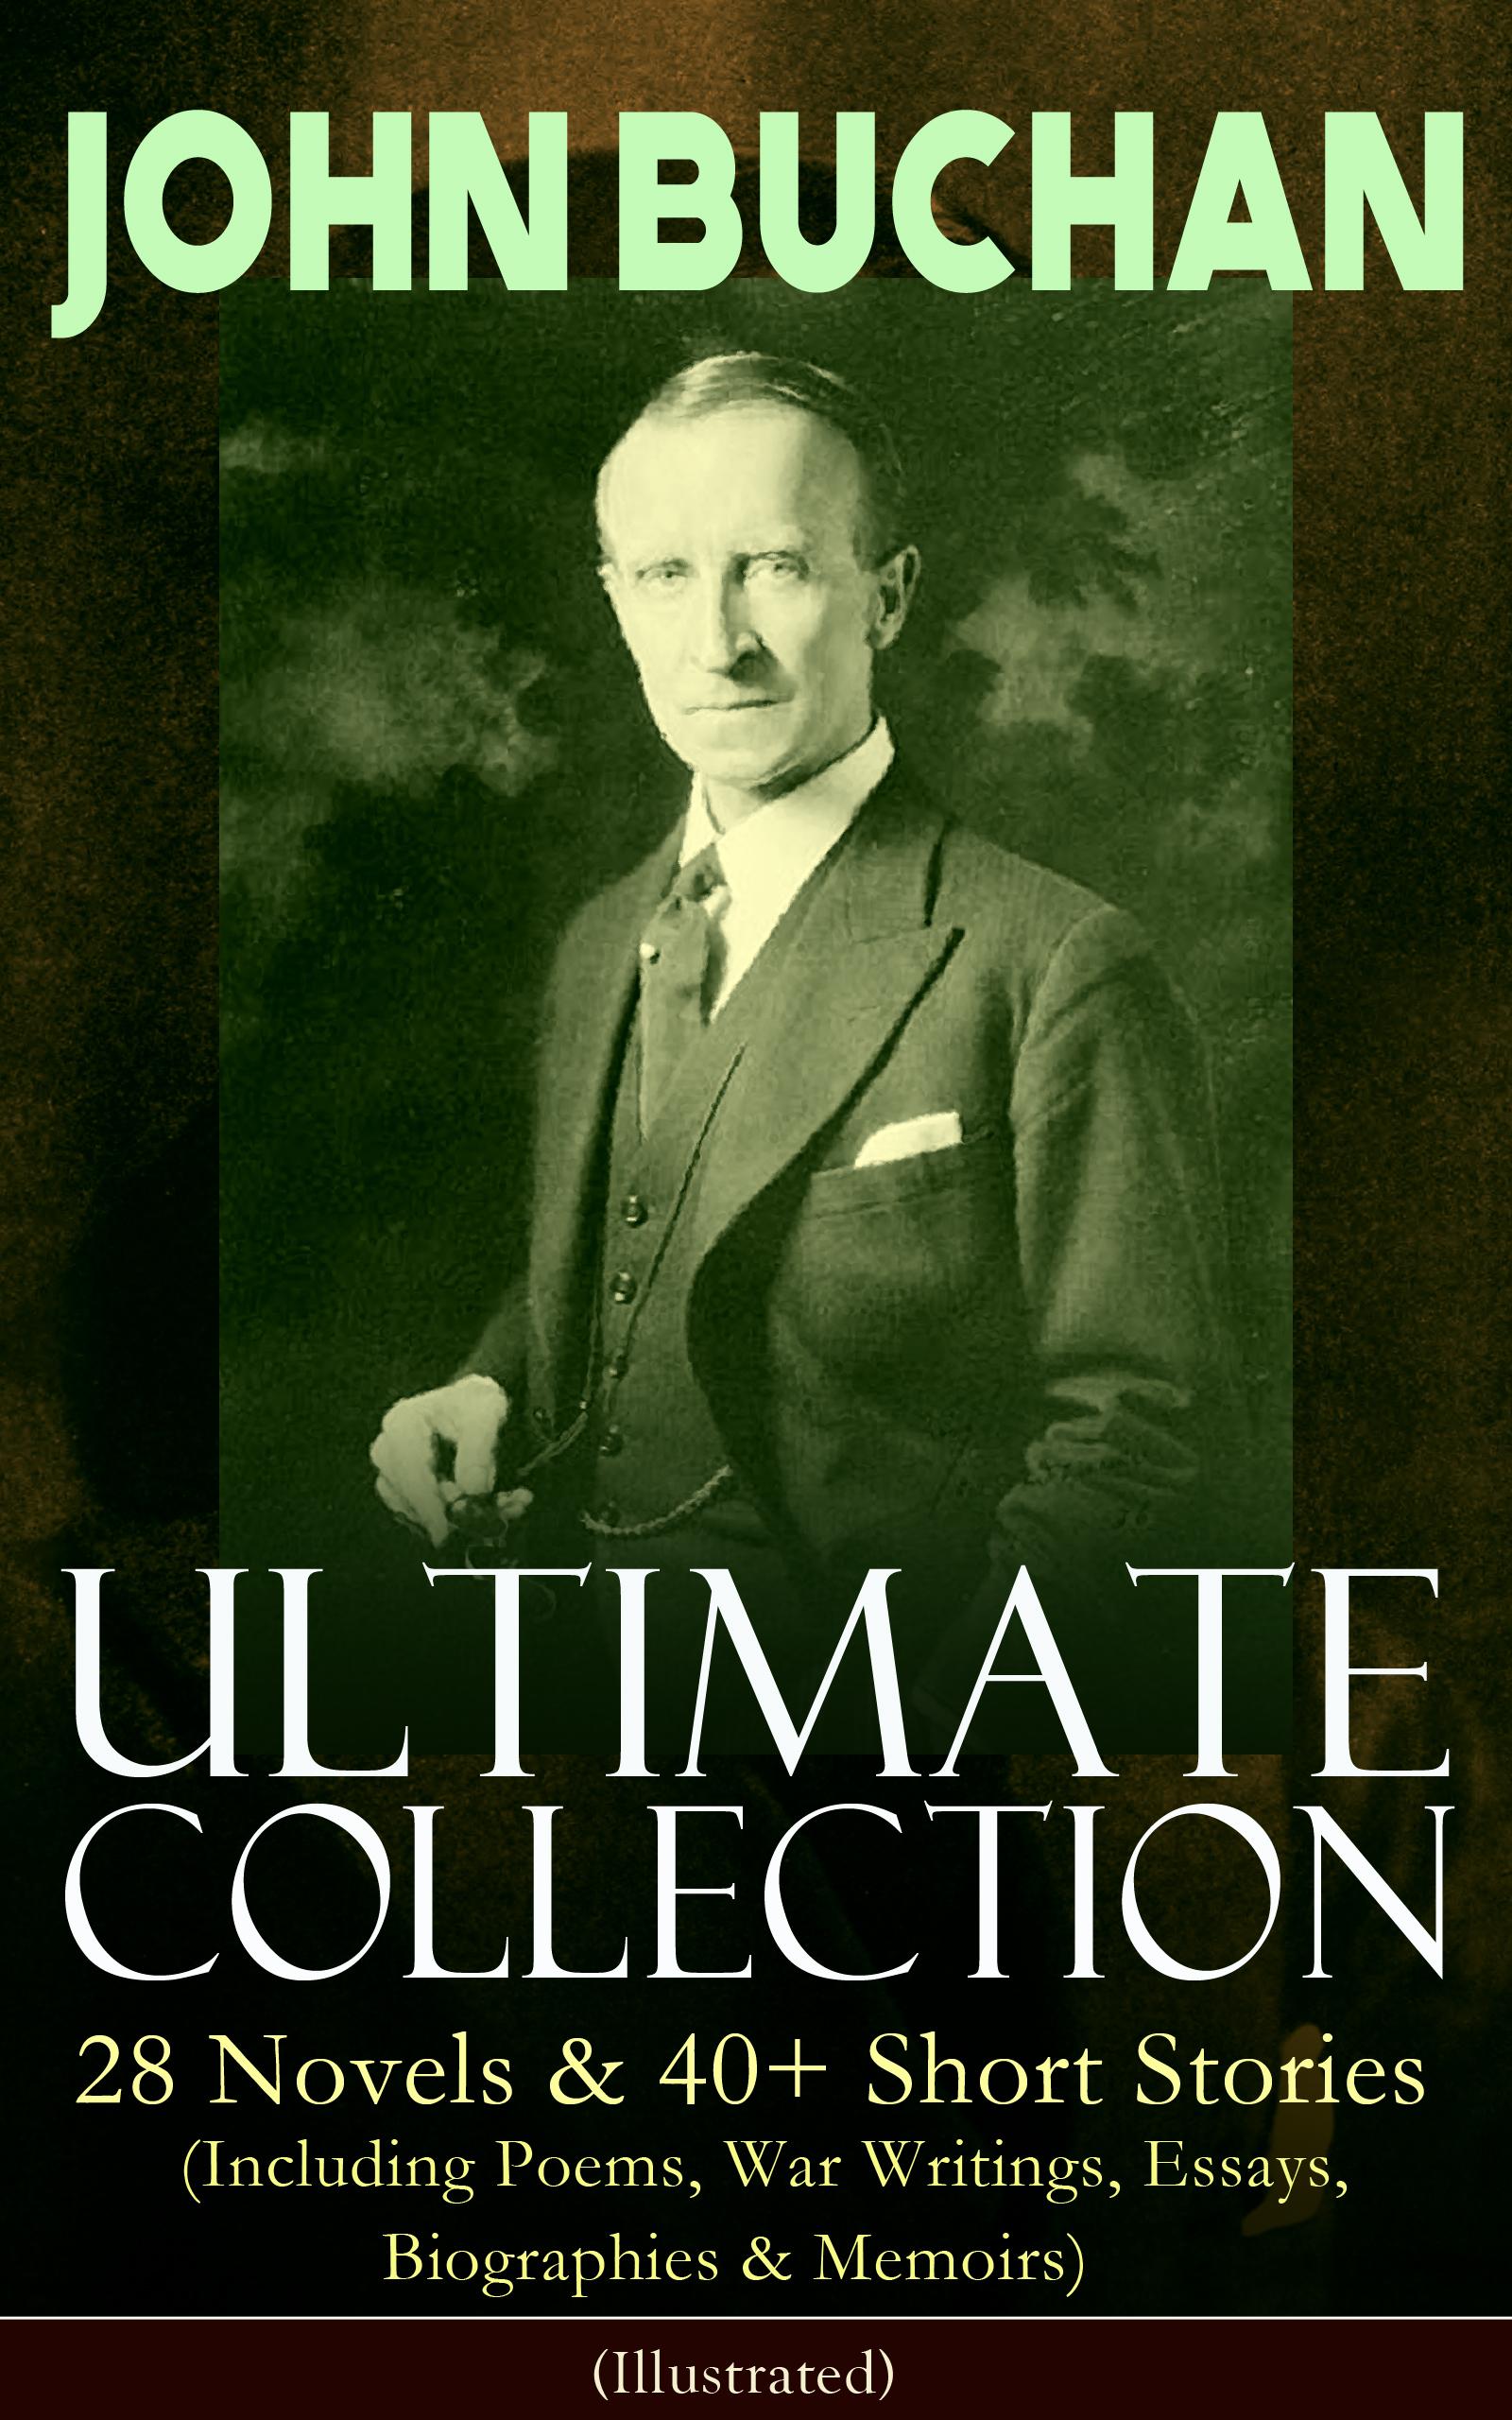 Buchan John JOHN BUCHAN – Ultimate Collection: 28 Novels & 40+ Short Stories (Including Poems, War Writings, Essays, Biographies & Memoirs) - Illustrated nunan timothy writings on war